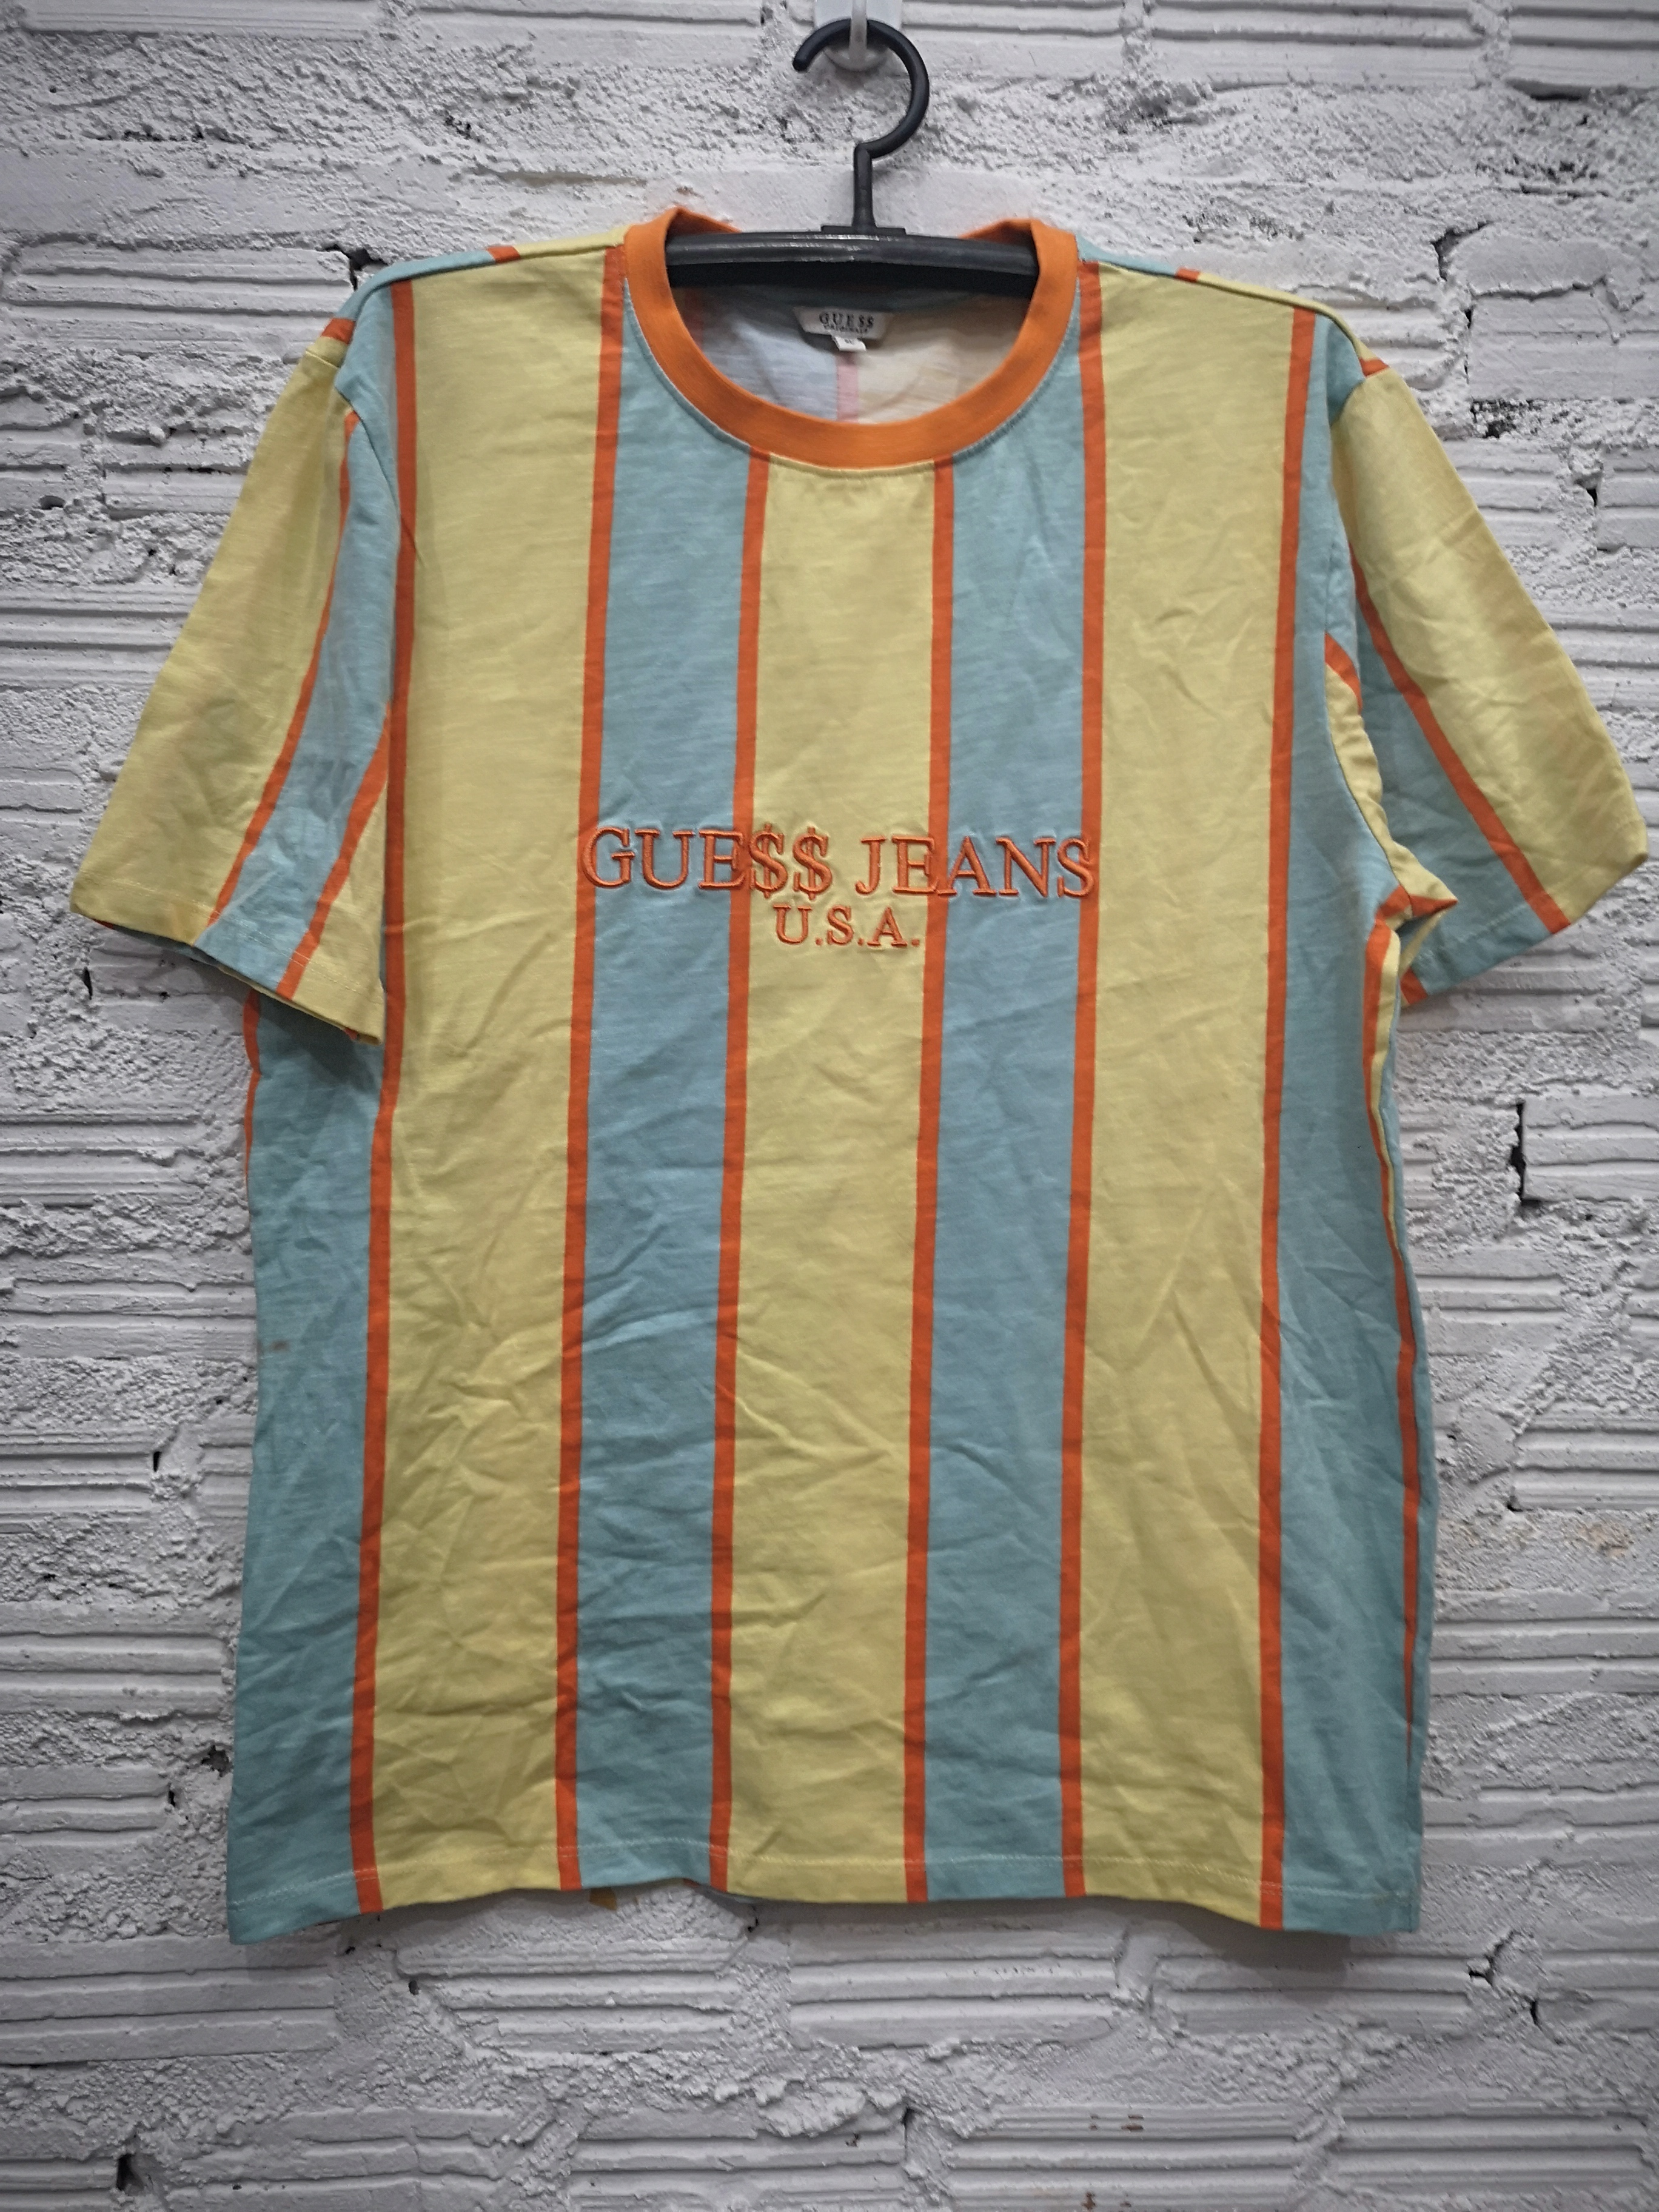 e46cf9e587 Guess ×. Guess x ASAP Rocky U.S.A Limited Yellow Orange Blue Striped T Shirt  ...